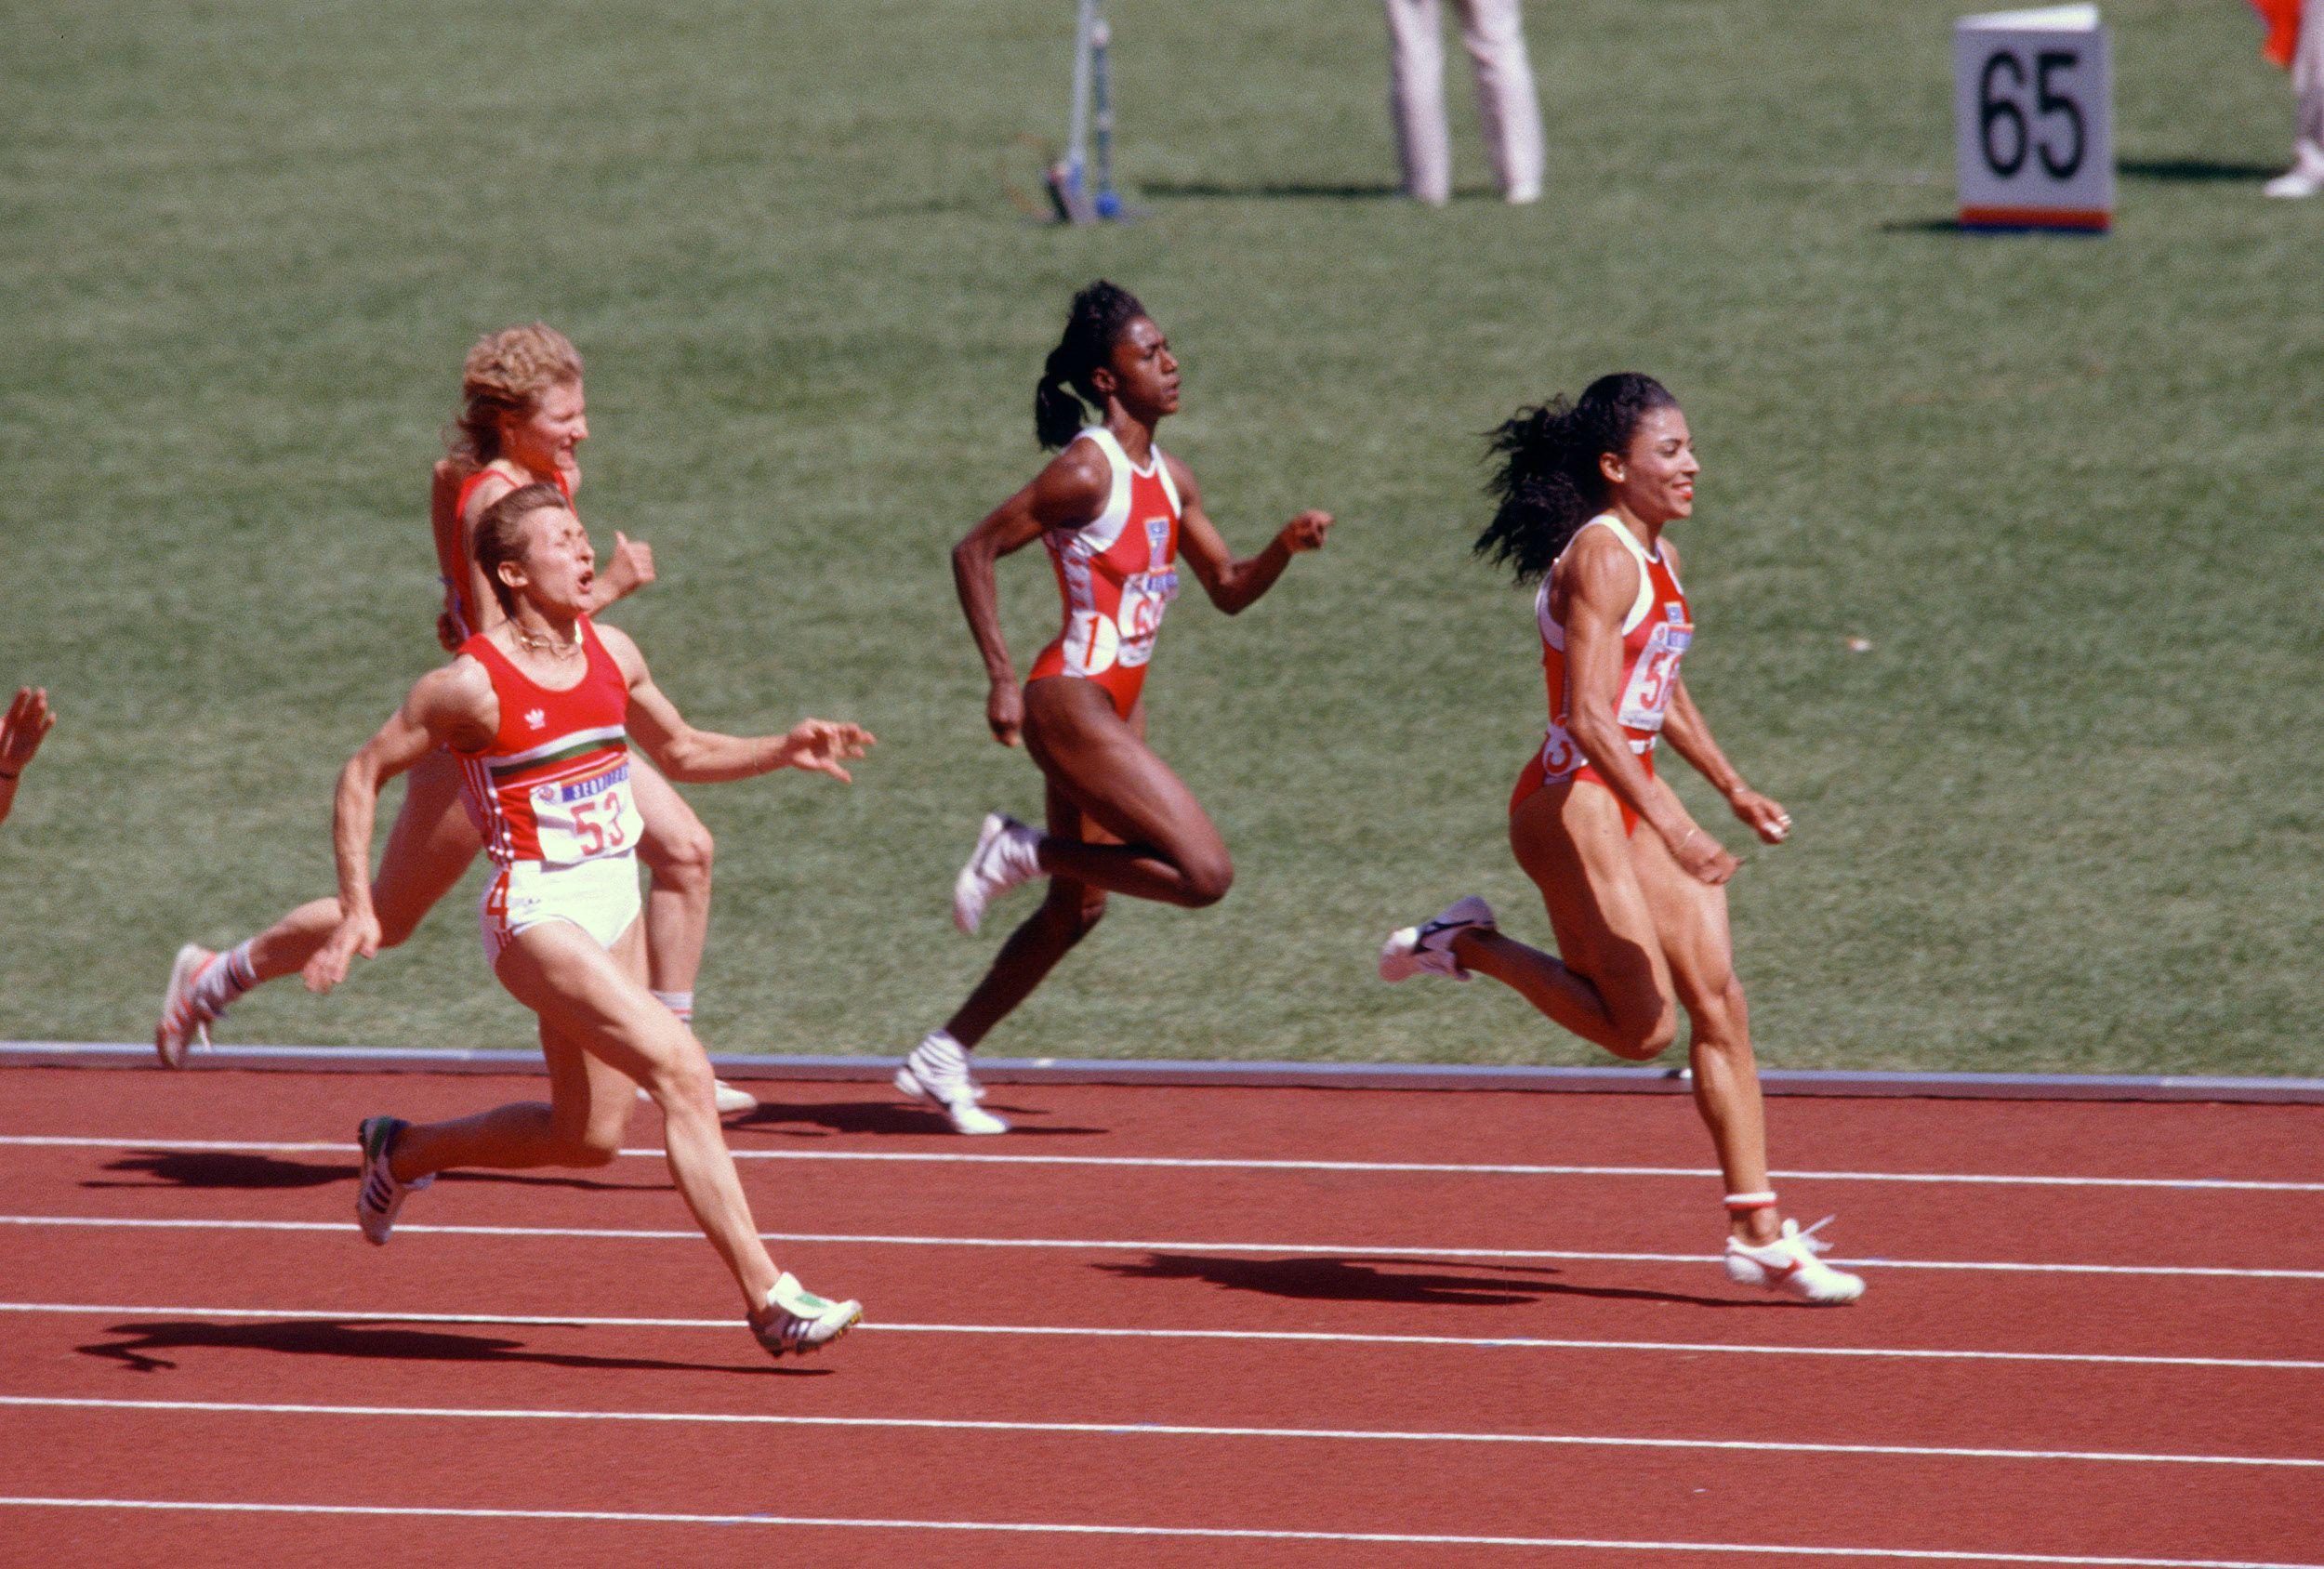 average running speed